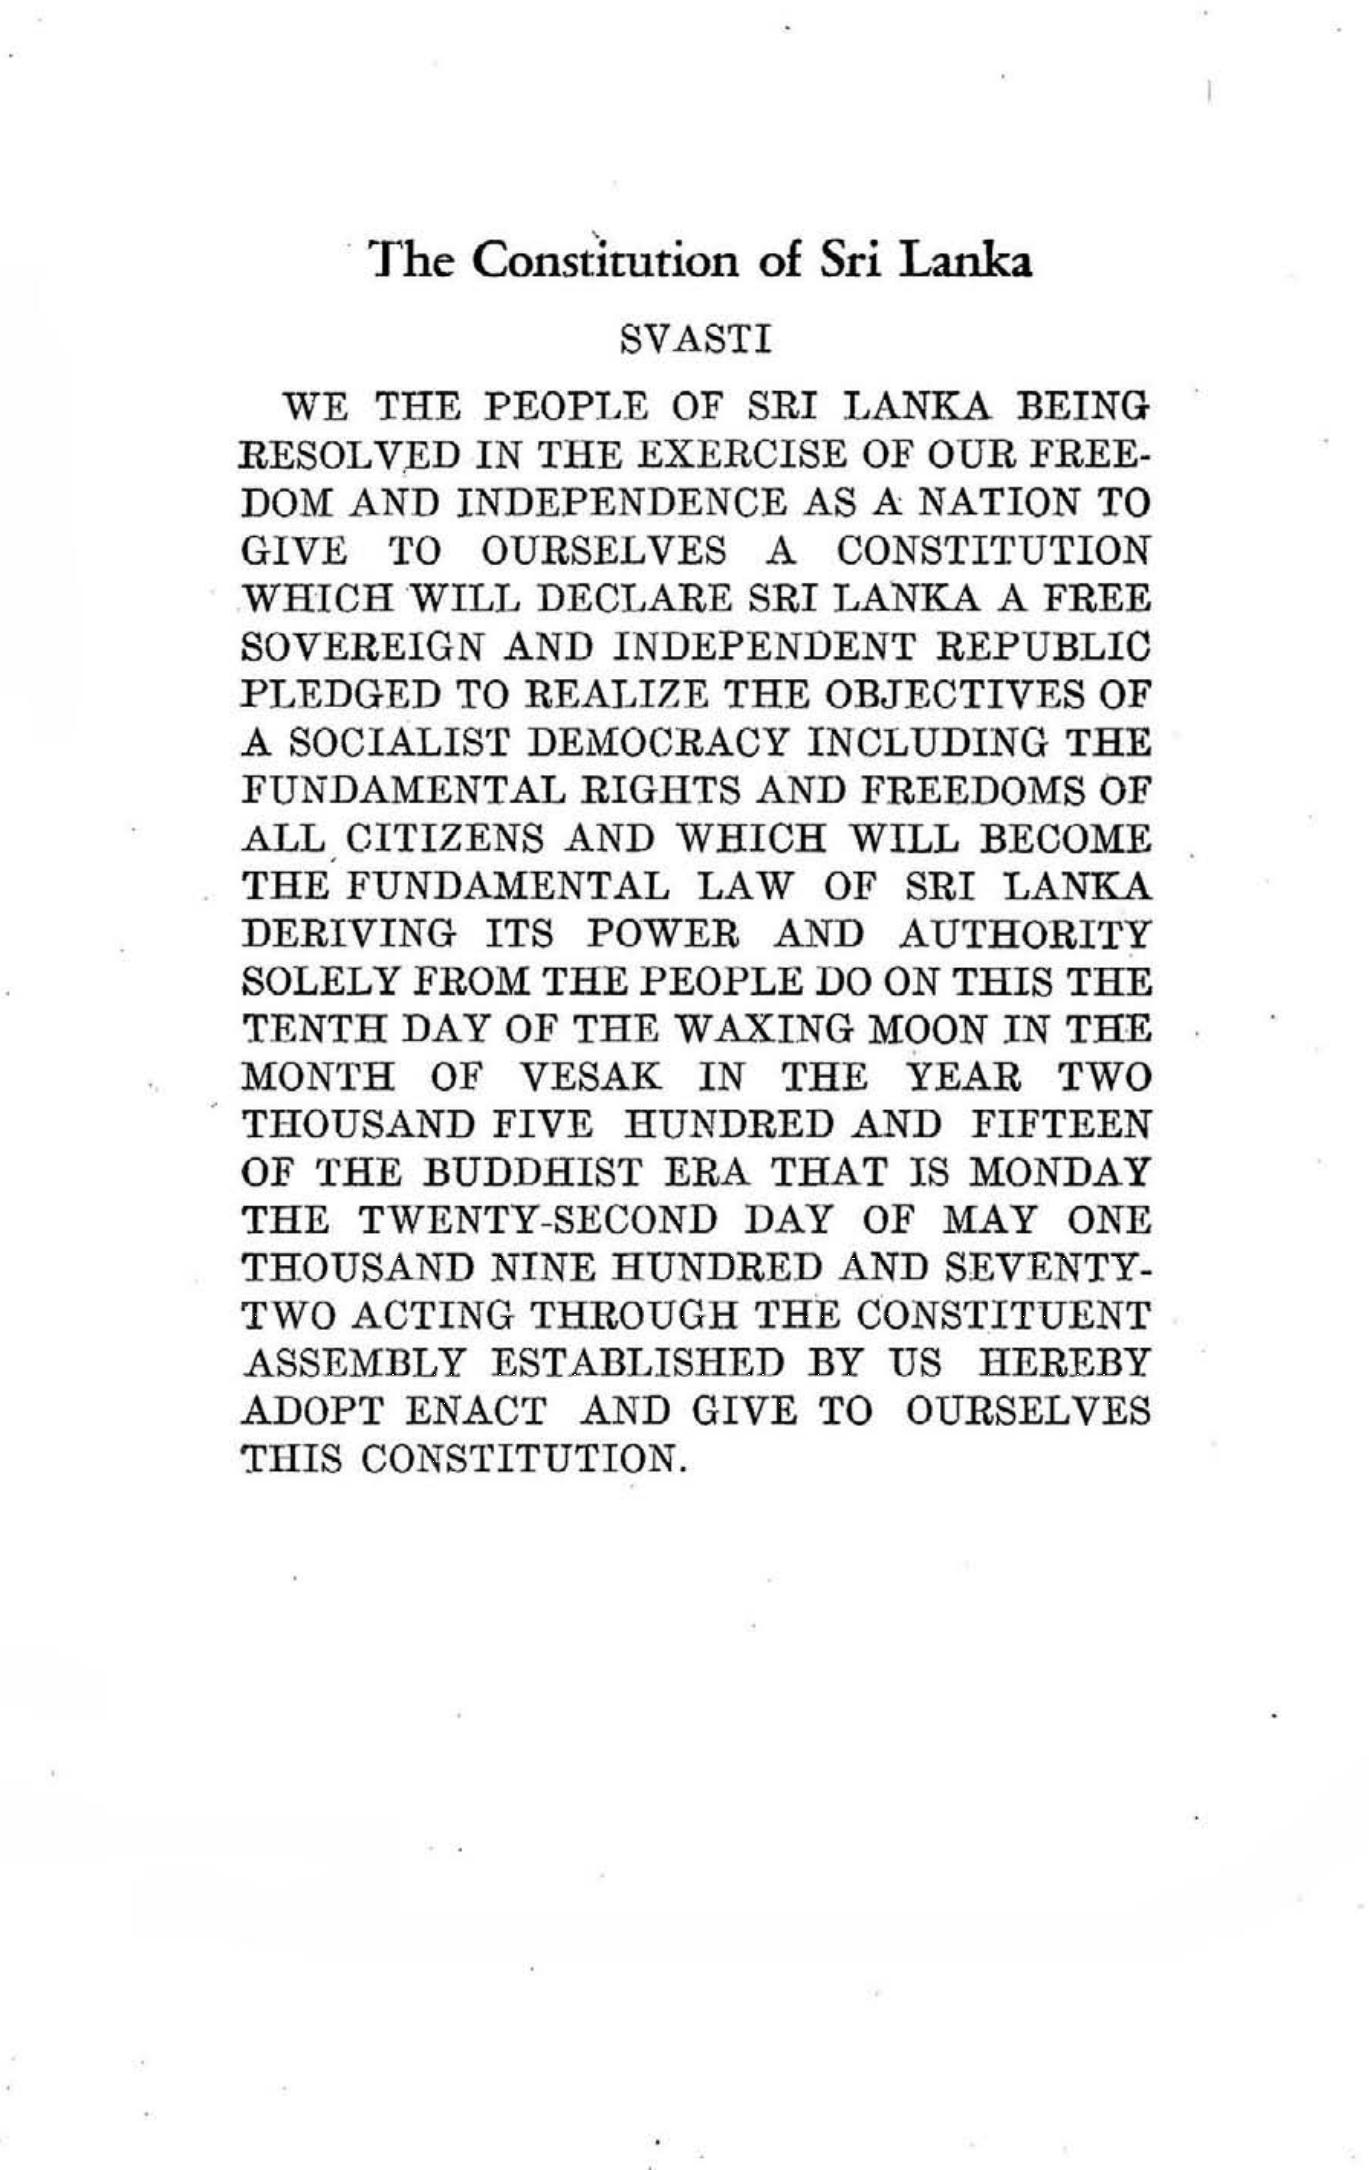 Sri Lankan Constitution of 1972 - Wikiwand